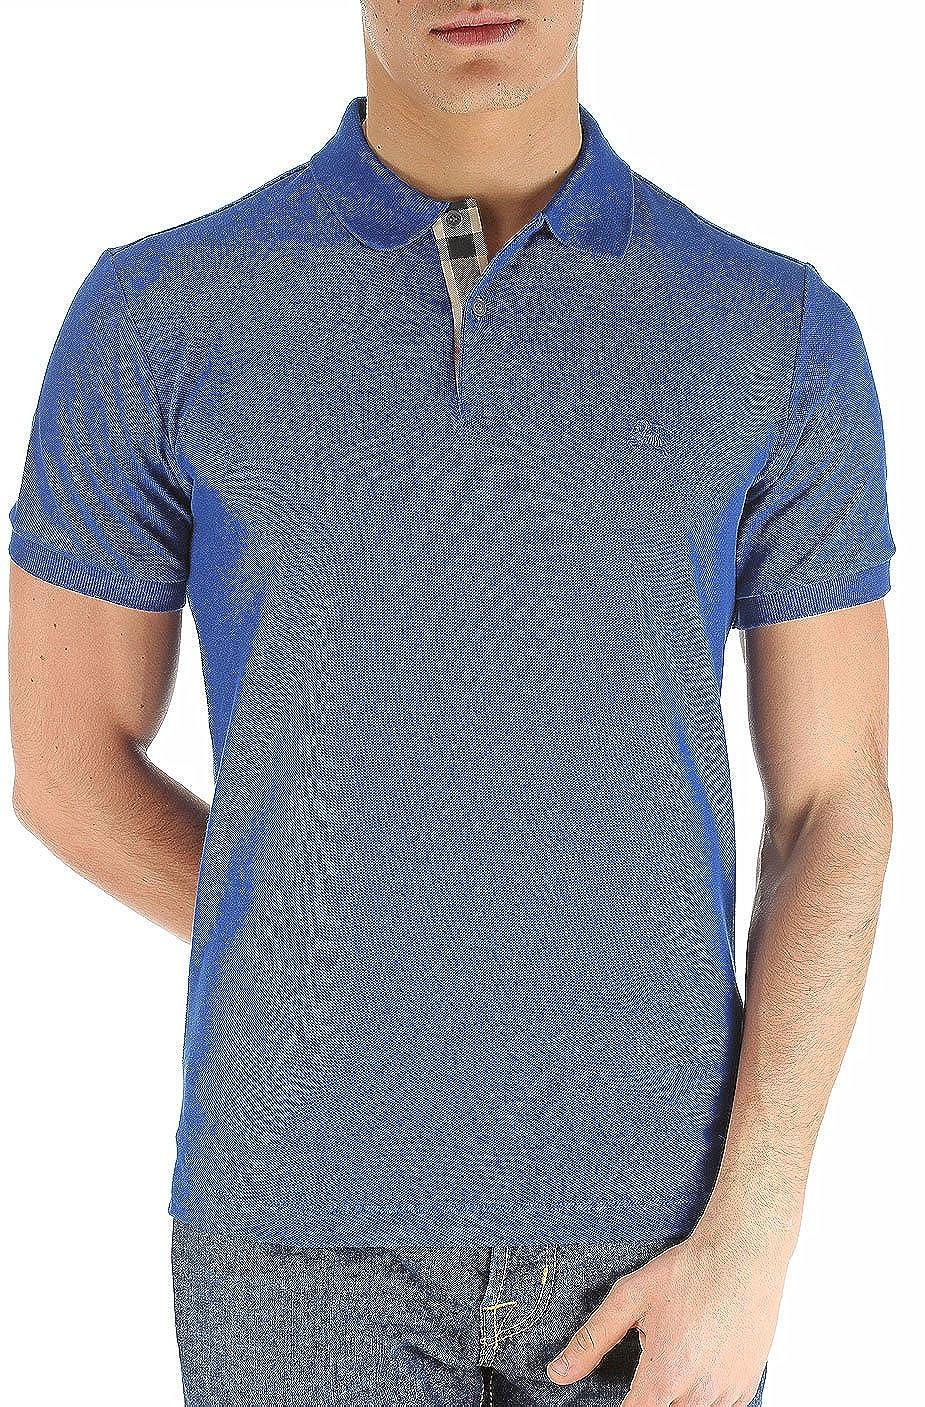 Burberry Brit Men s Check Placket Pique Bright Navy Blue Polo Shirt Modern  Fit (X-Large)  Amazon.co.uk  Clothing 1323c55882a4